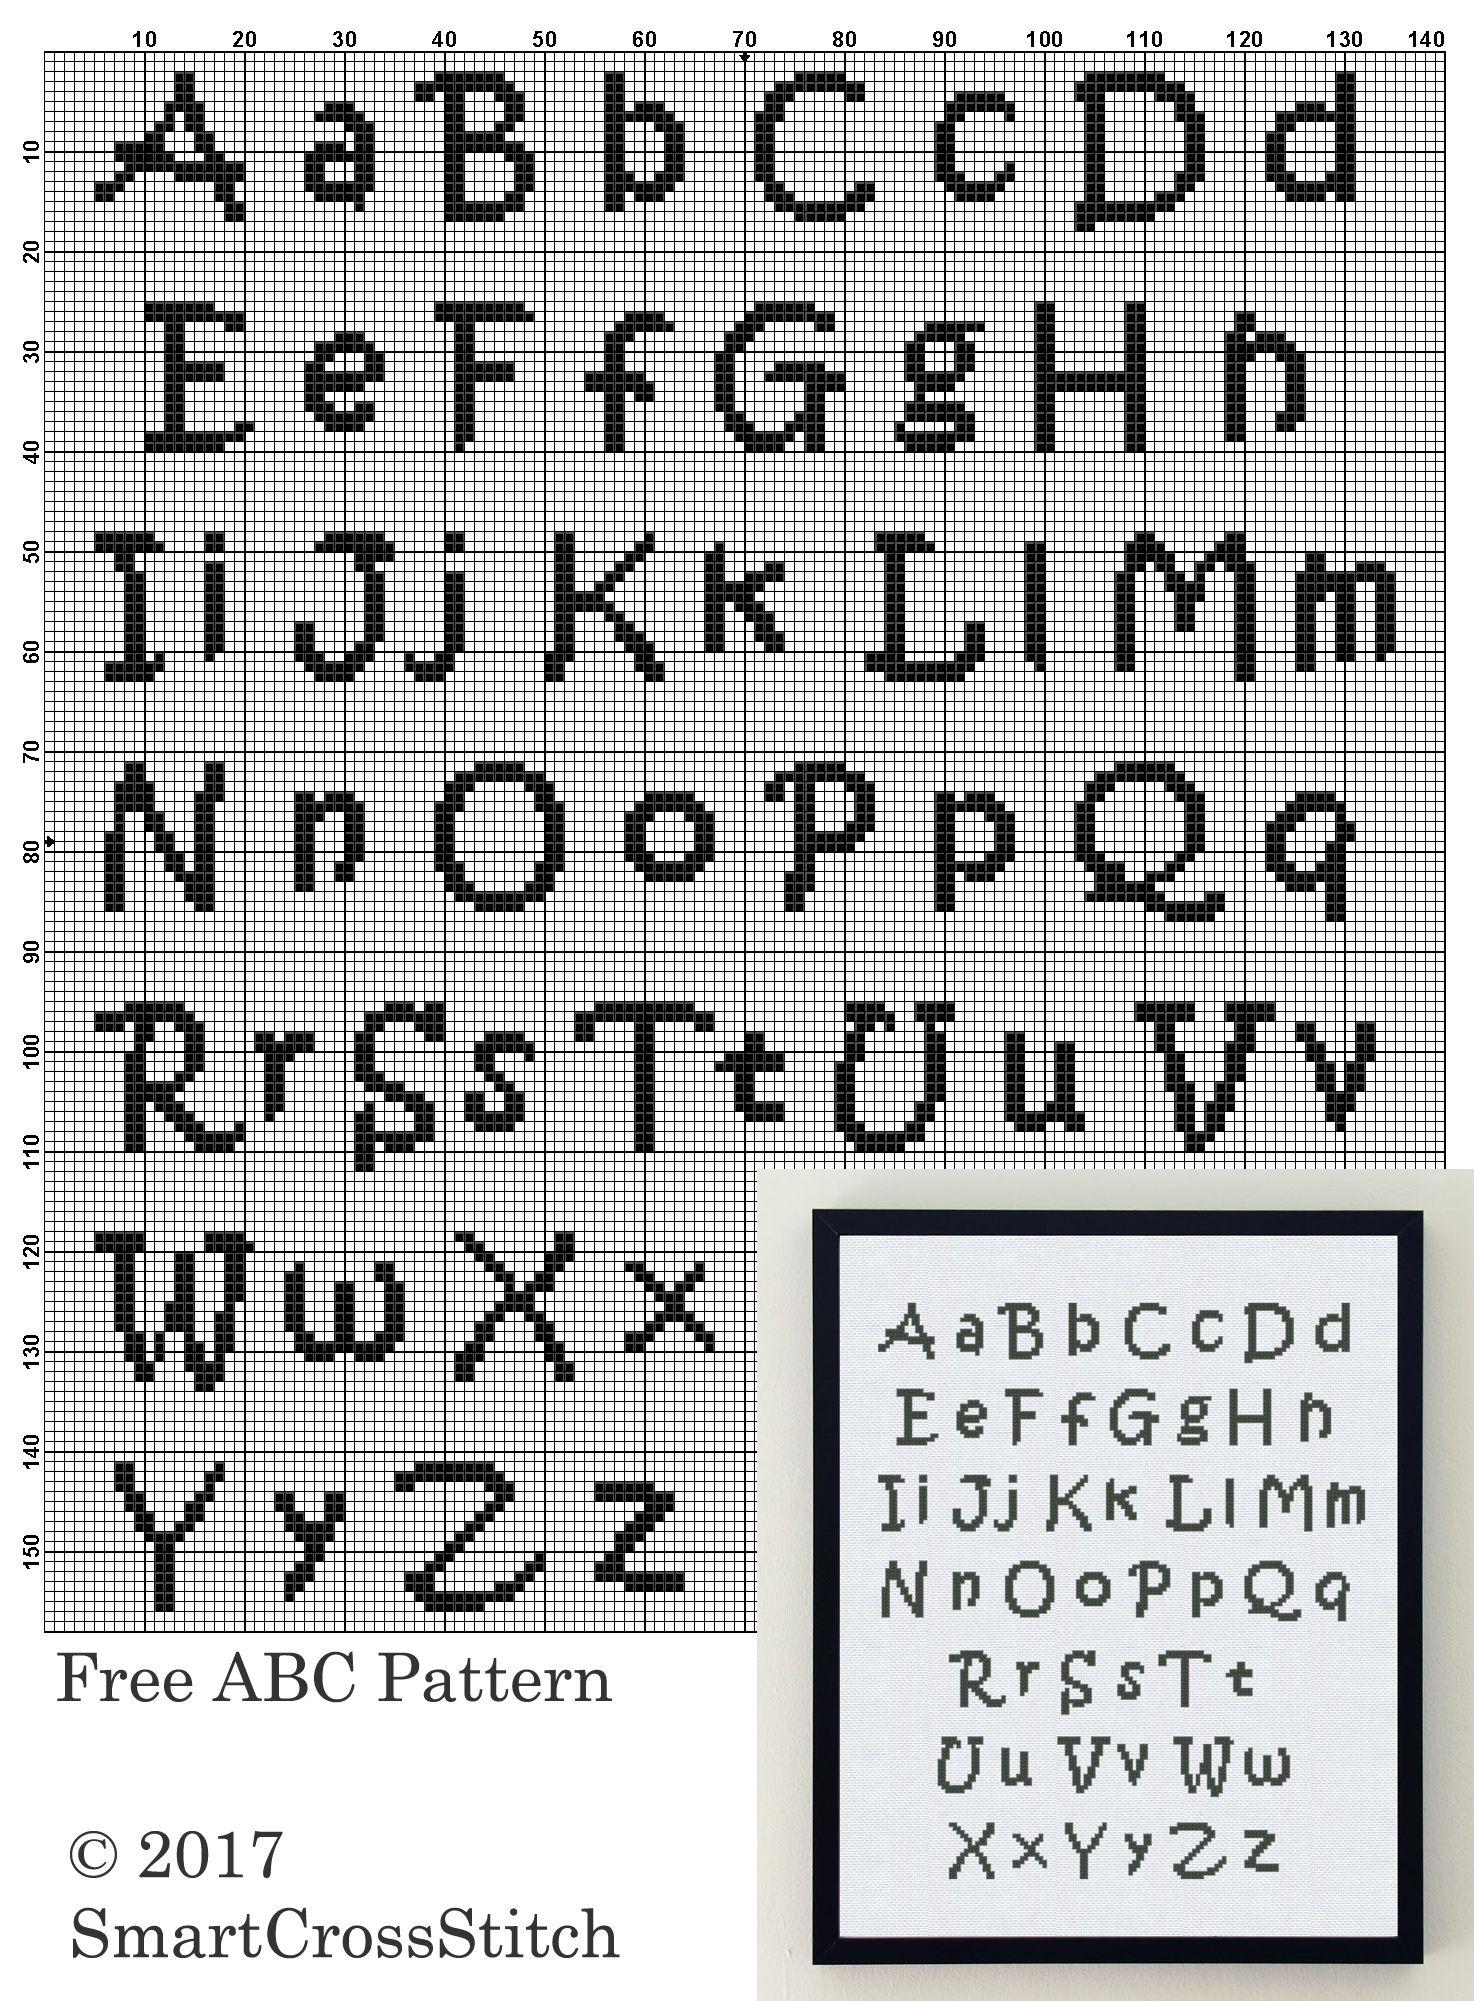 Free Cross Stitch Alphabet Patterns : cross, stitch, alphabet, patterns, Cross, Stitch, Alphabet, Pattern, ''ABC'', Embroidery, Design, Letter, Patterns,, Fonts